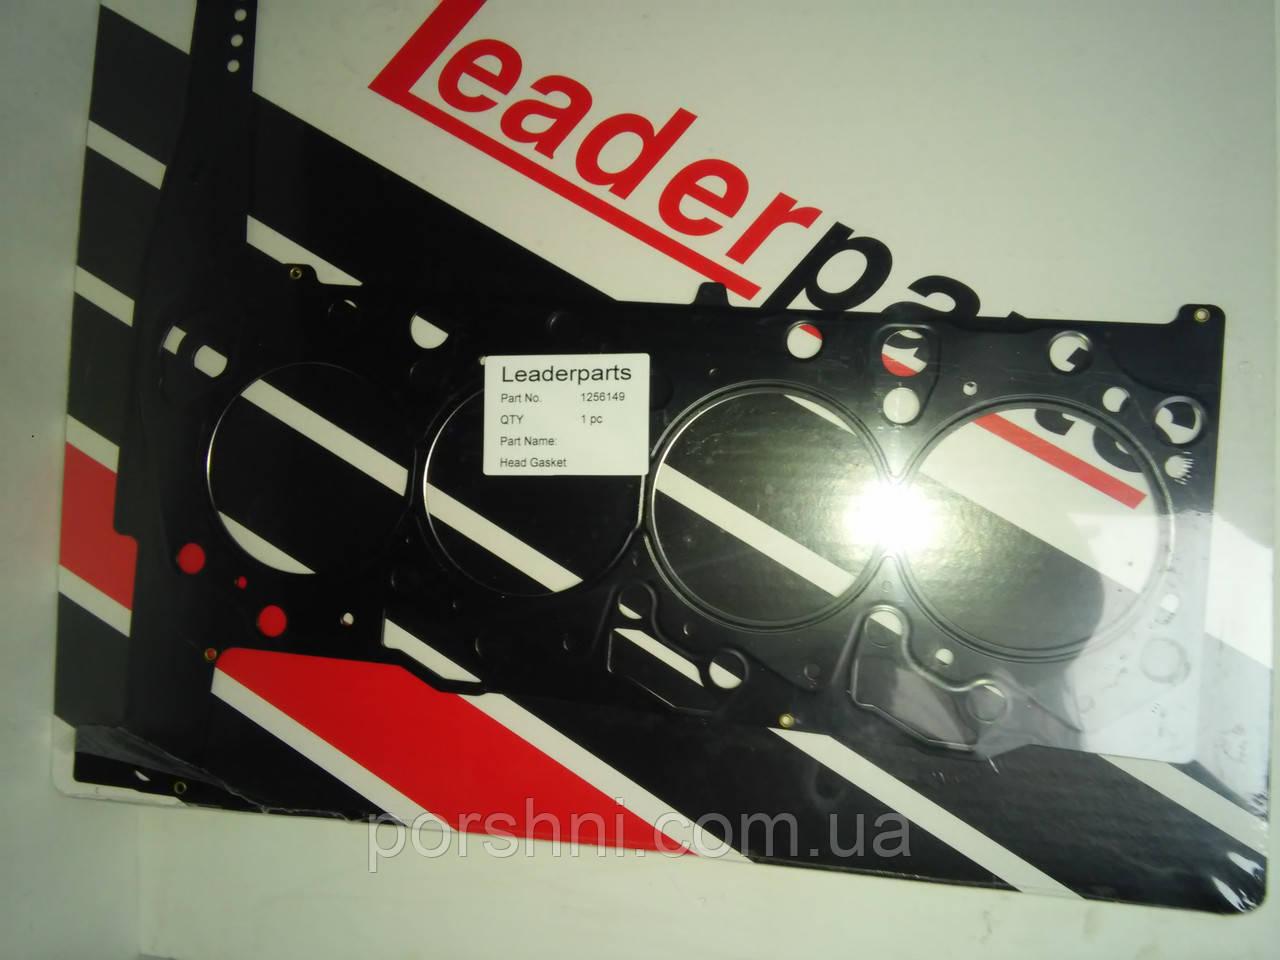 Прокладка  головки Ford Тransit  2.4 DI   2001 -- 3м.  Leaderparts 1256149